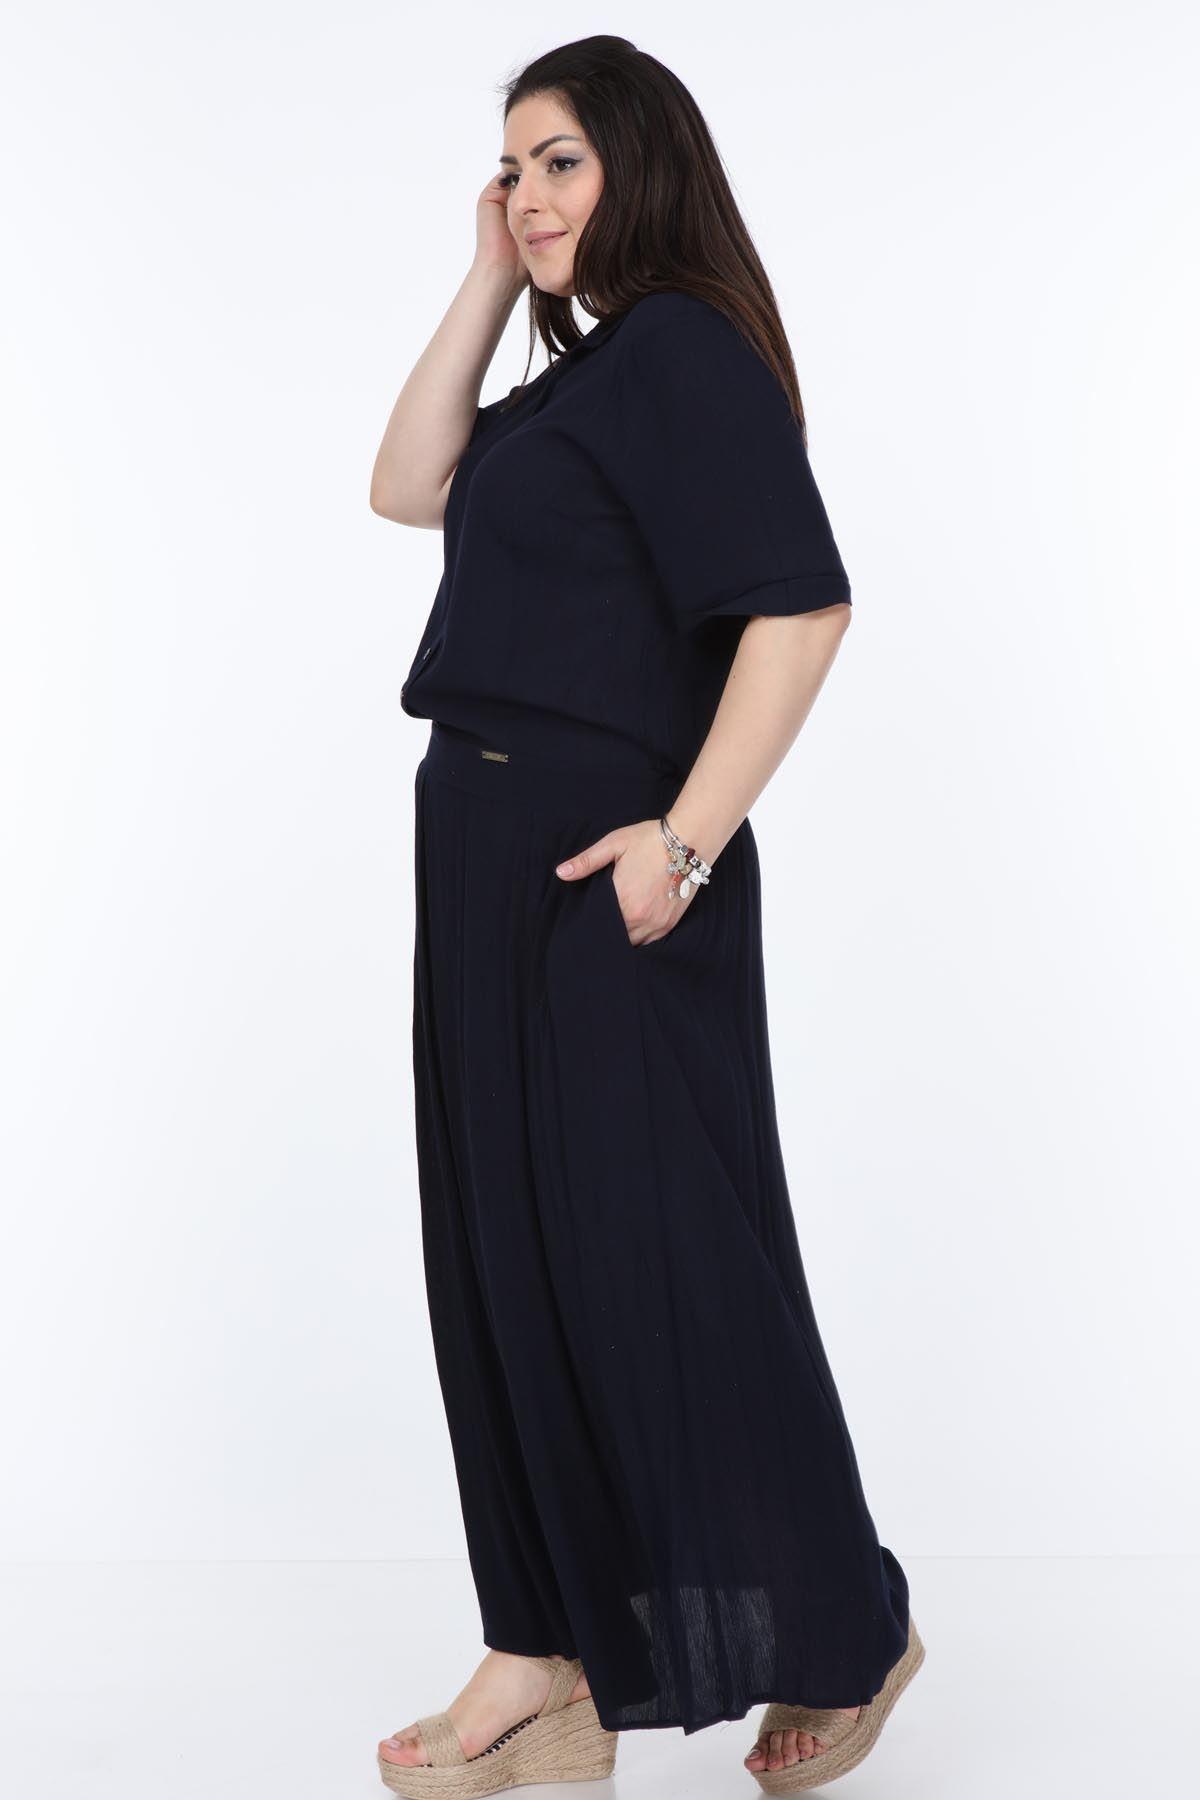 Lacivert Uzun Elbise 22D-1064